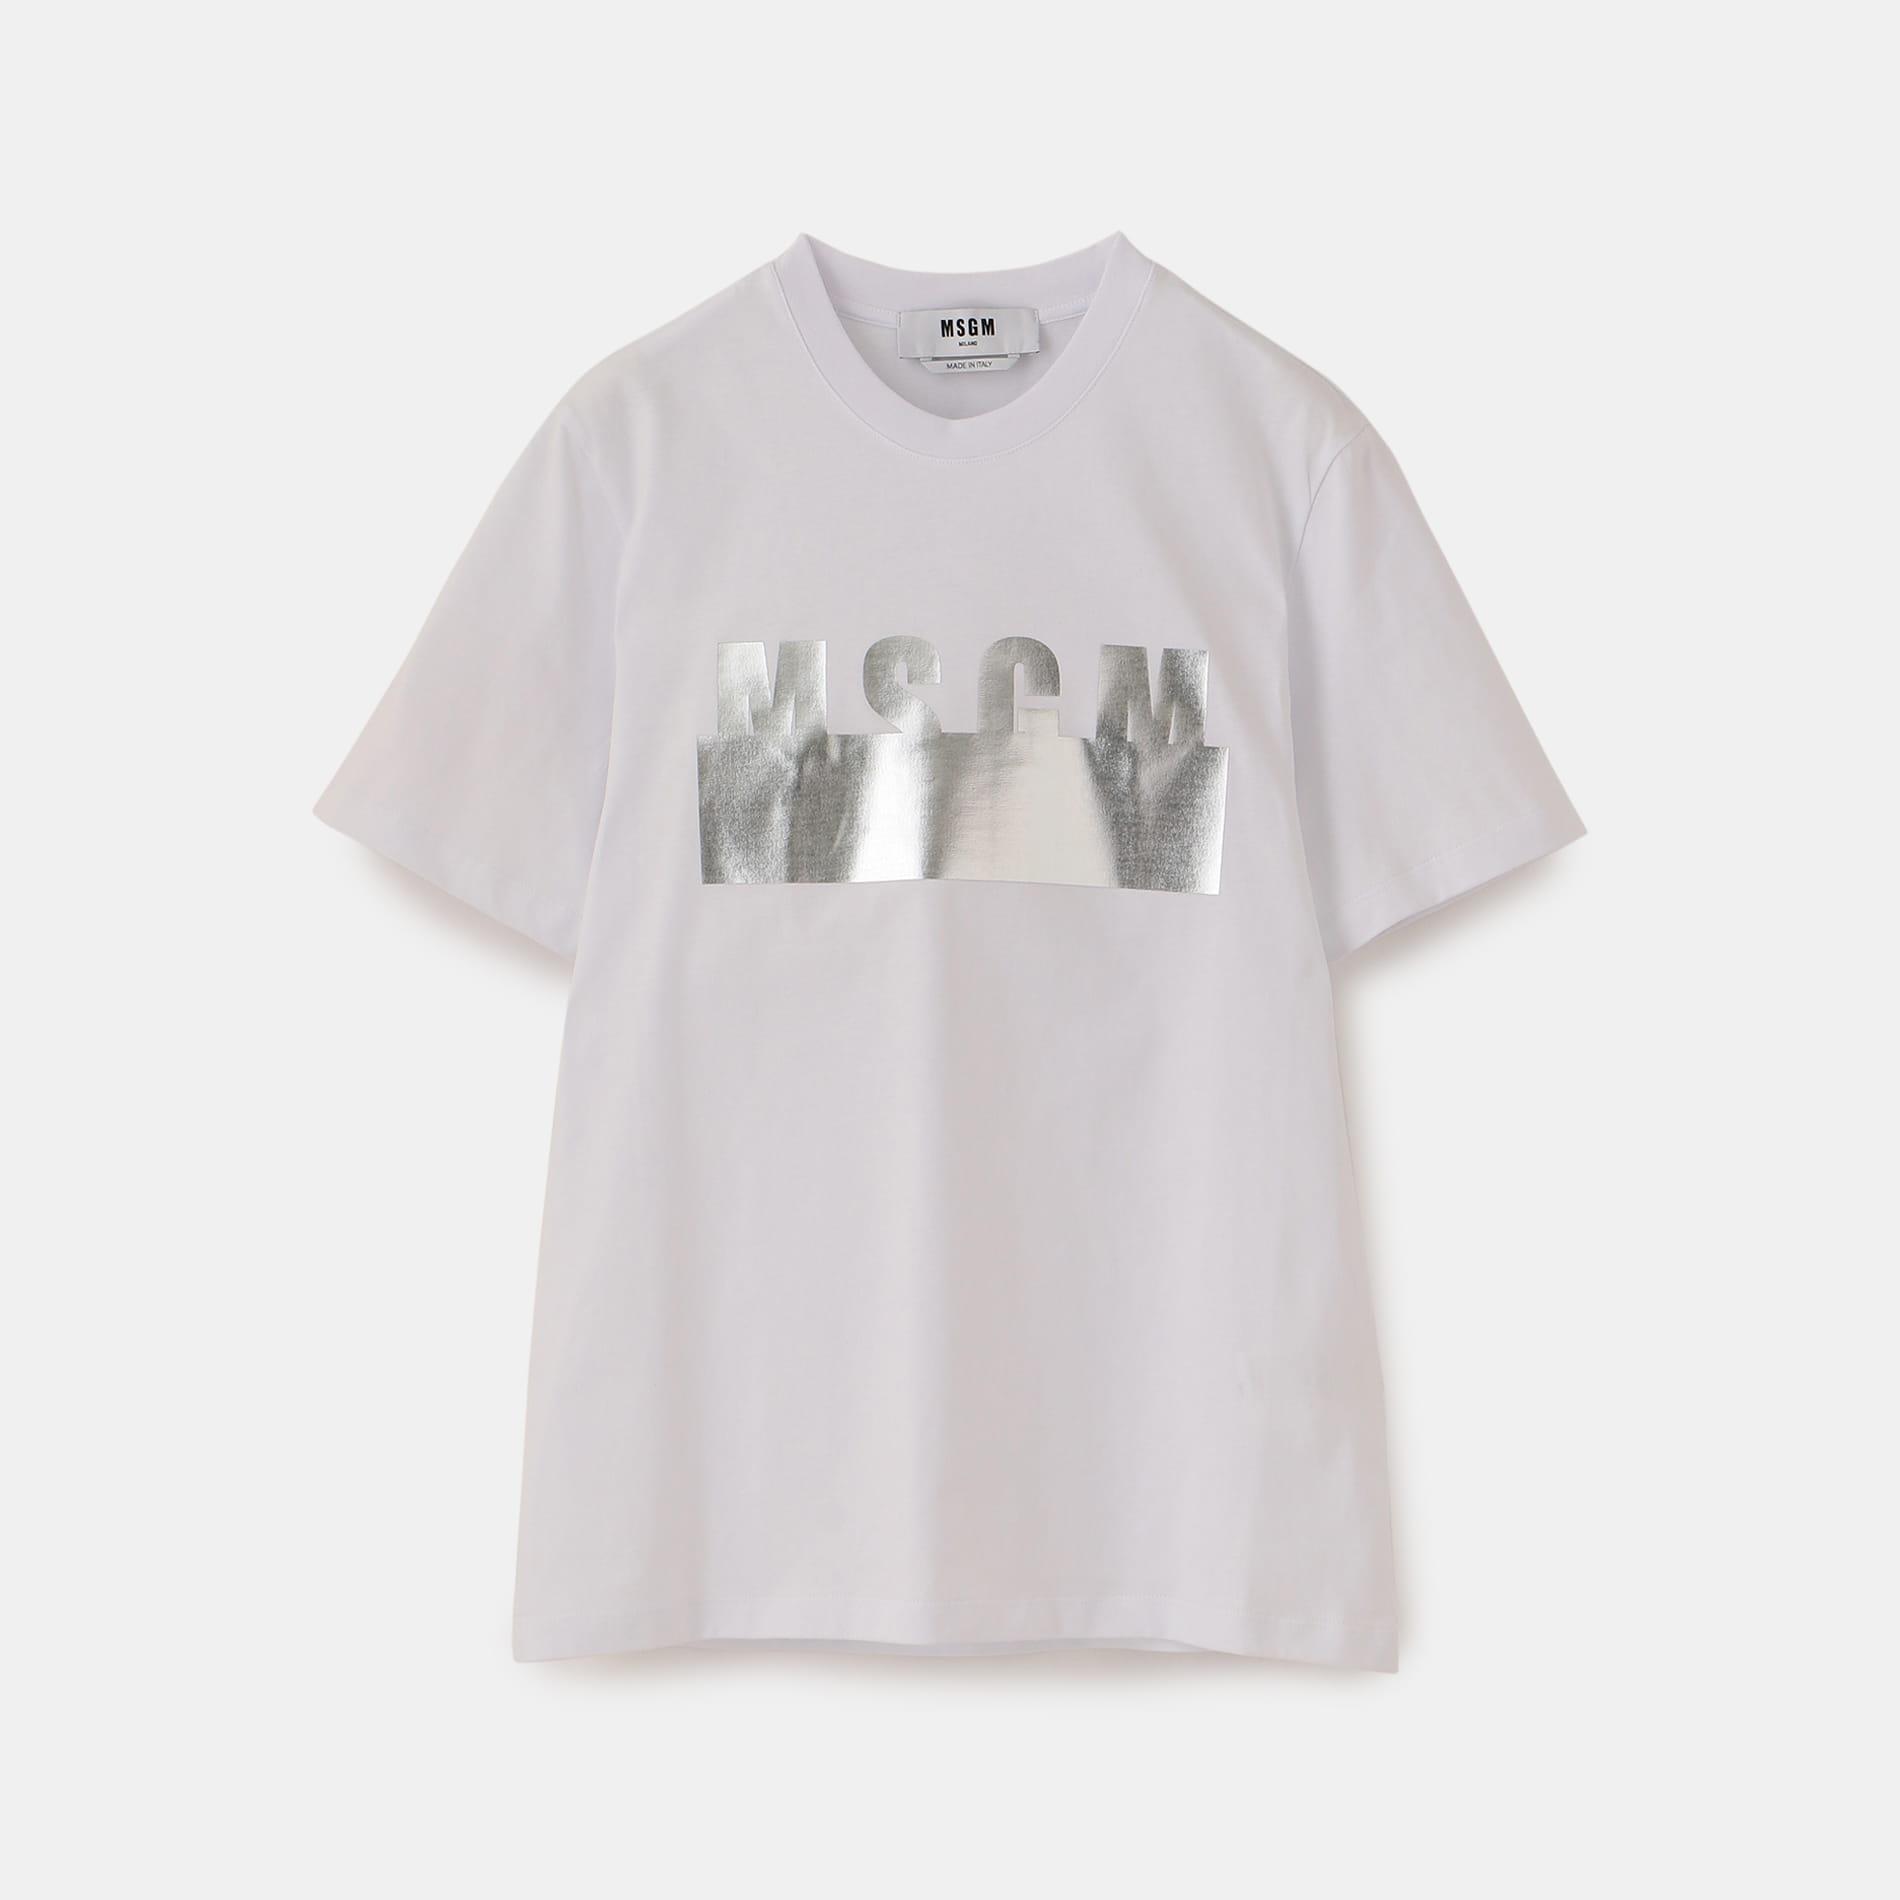 【MSGM】WOMEN T-SHIRT 2841MDM180